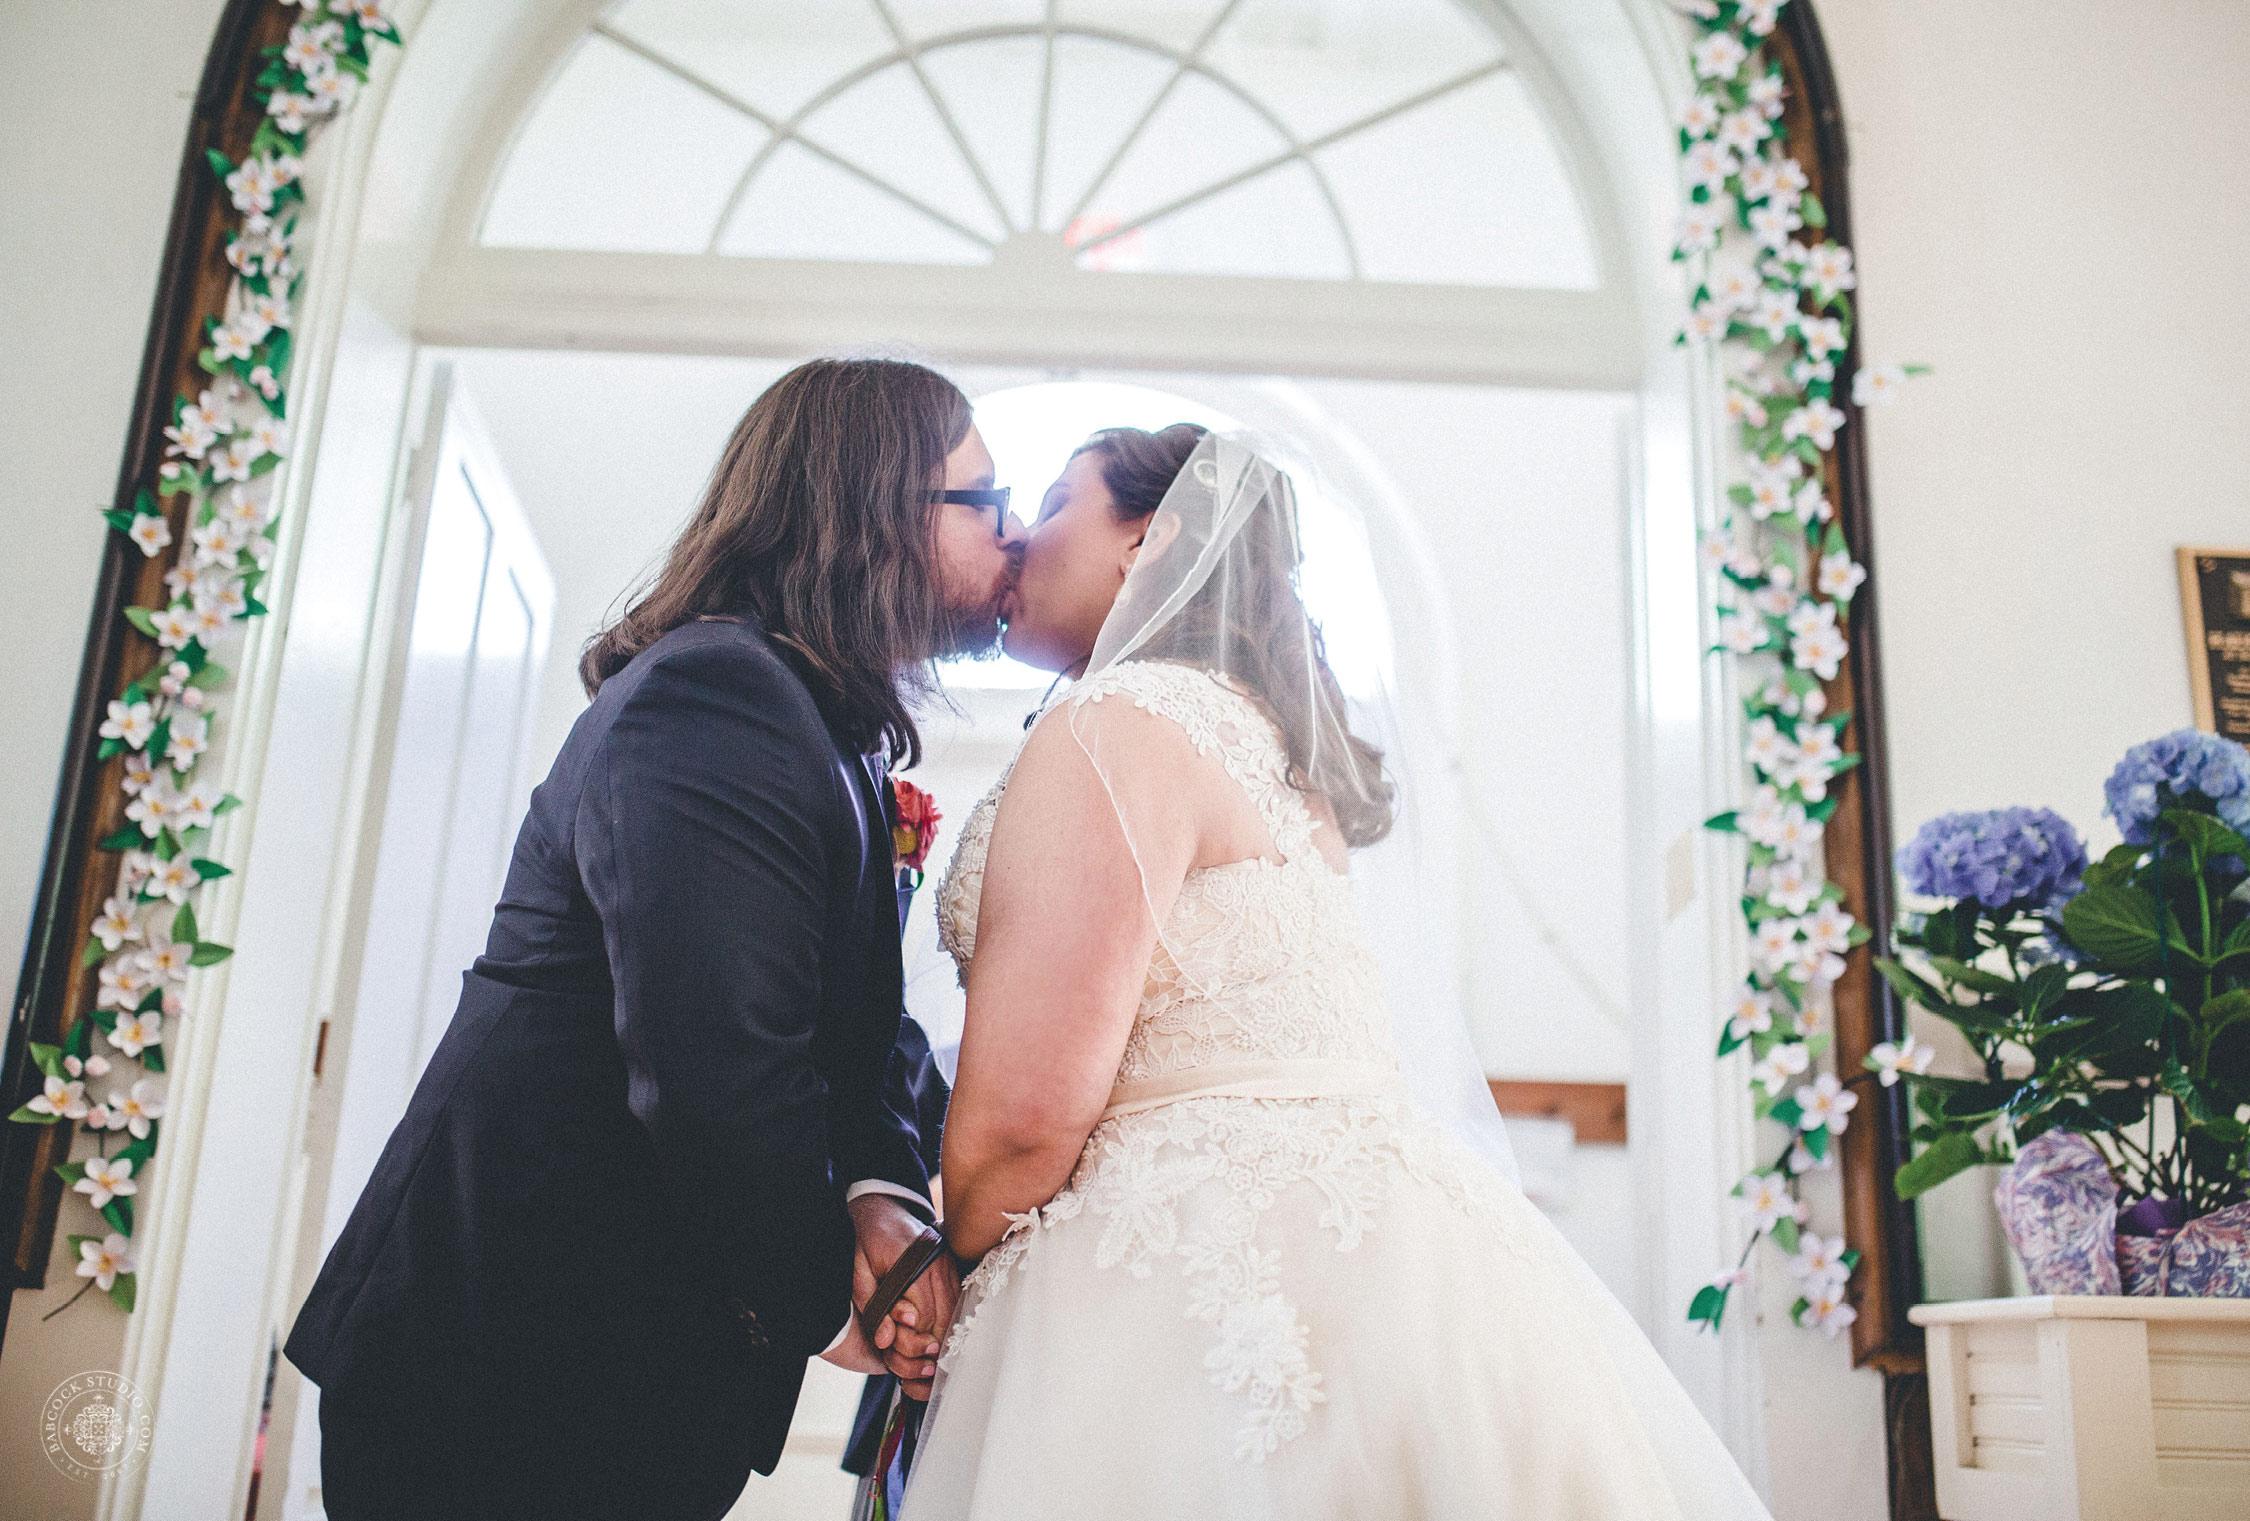 nicole-brendarn-school-house-wedding-photographer-dayton-ohio-12.jpg